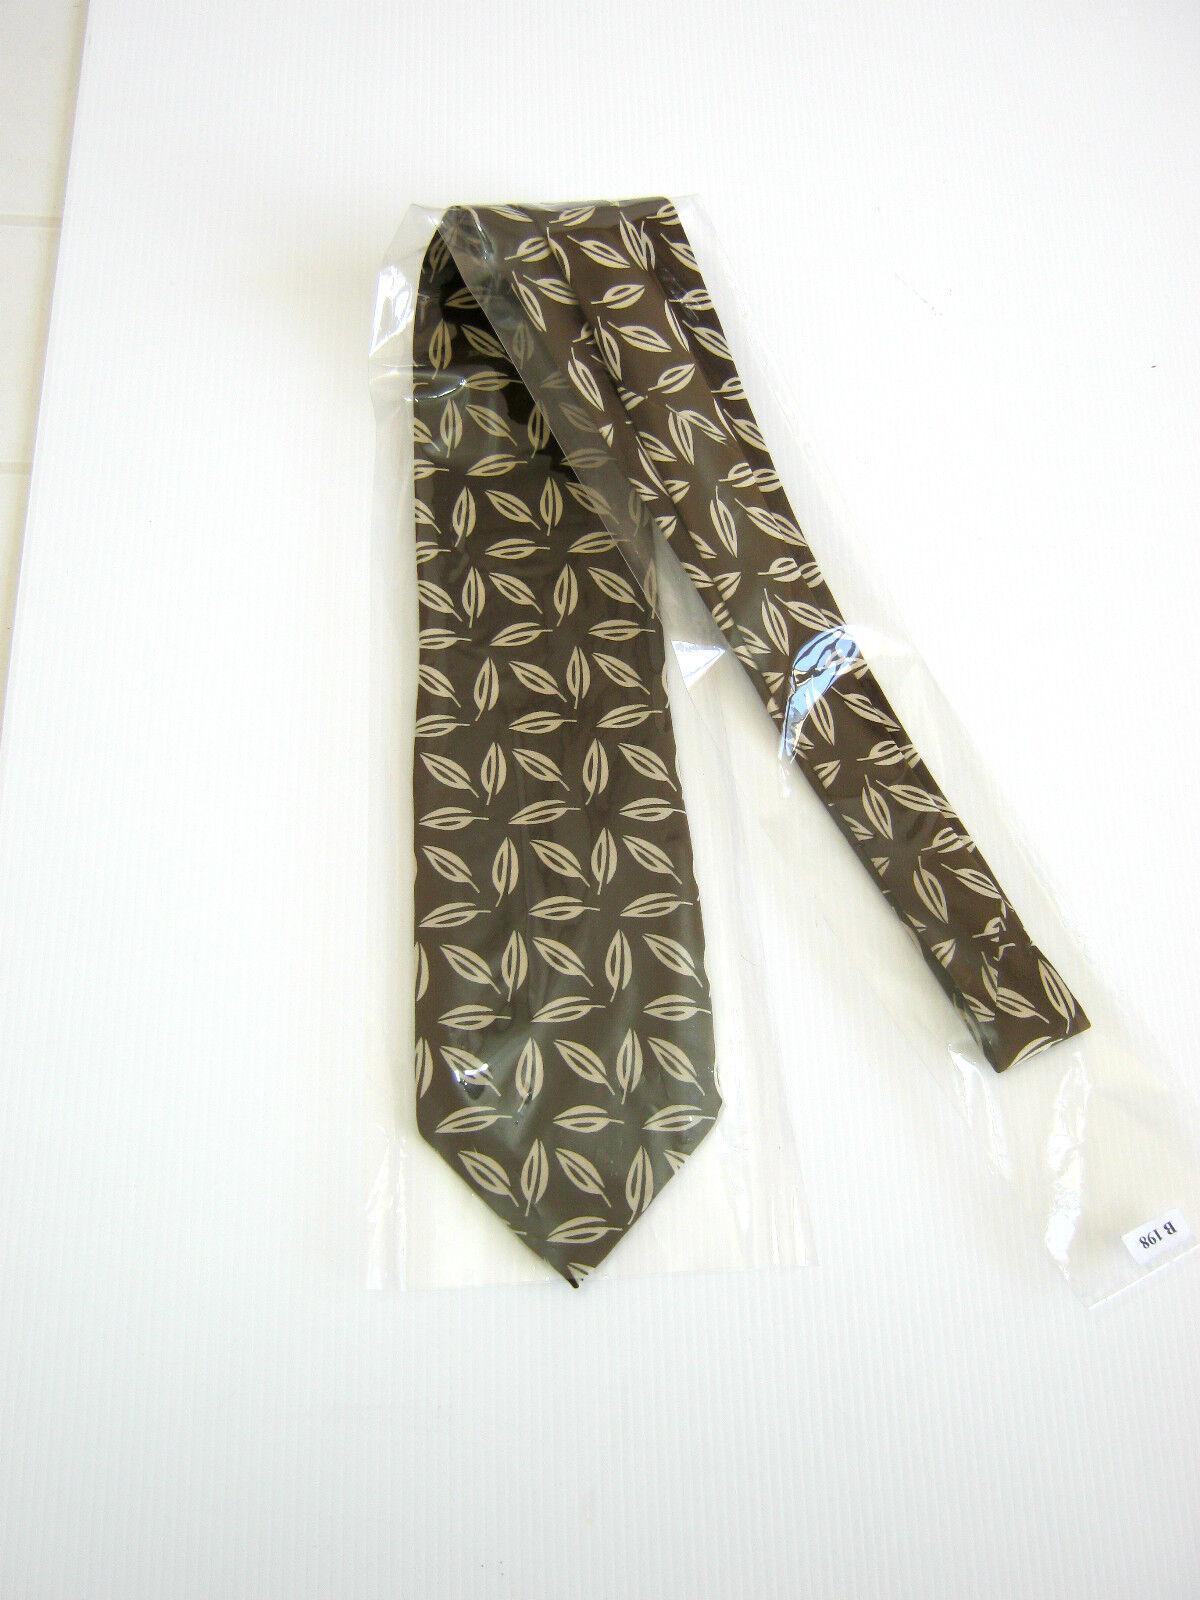 HUGO BOSS  Cravatta Tie NUOVA NEW Originale 100% 100% Originale SETA SILK IDEA REGALO 2b7982